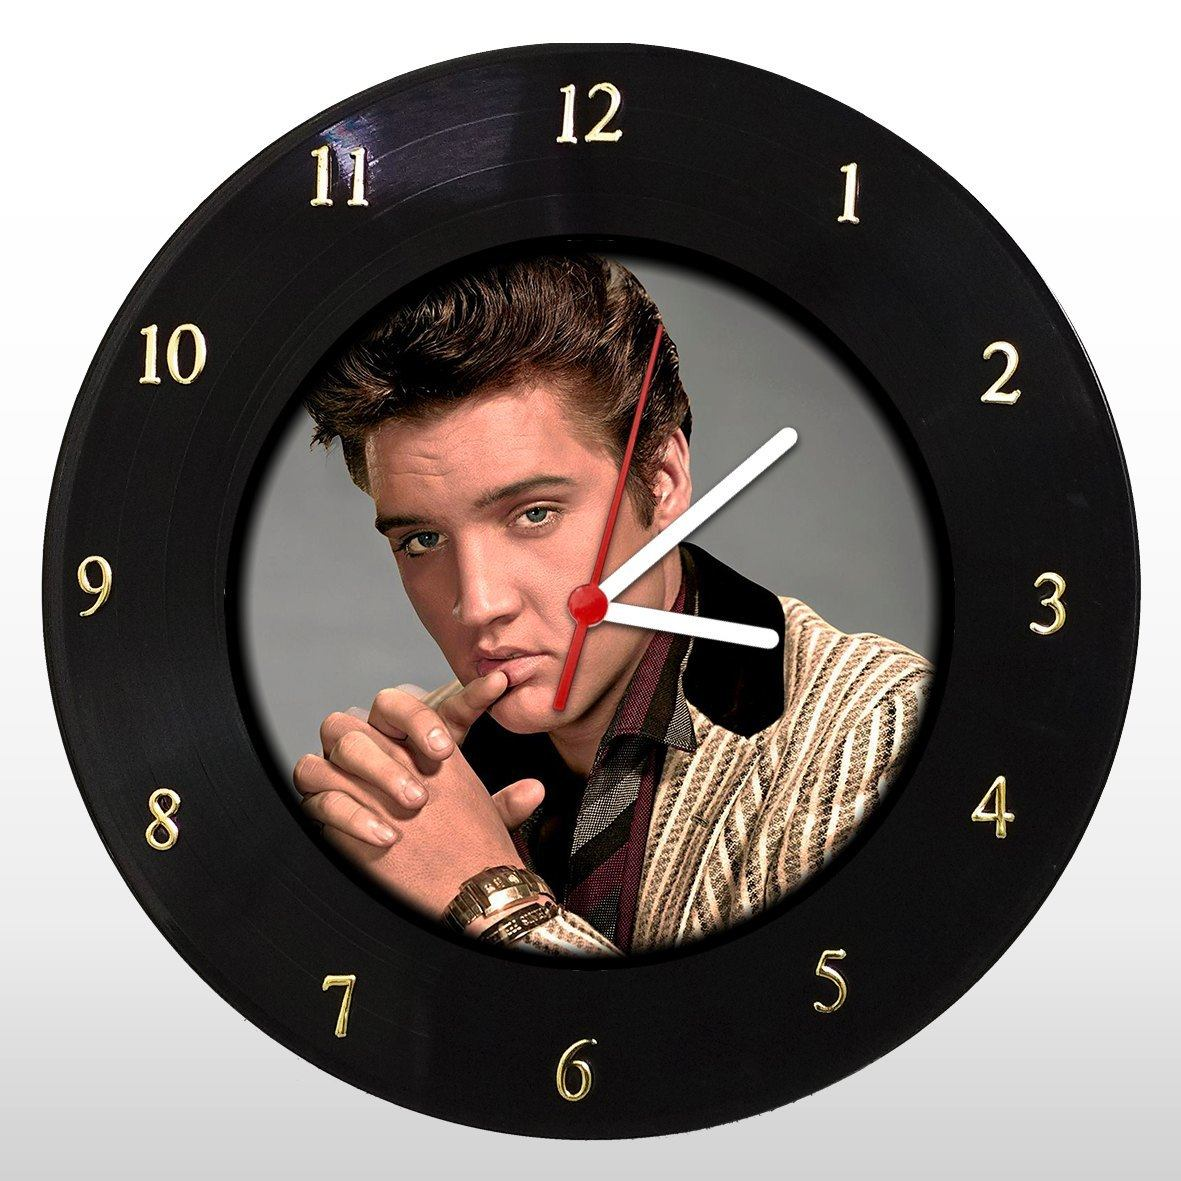 Elvis Presley - Relógio de Parede em Disco de Vinil - Mr. Rock